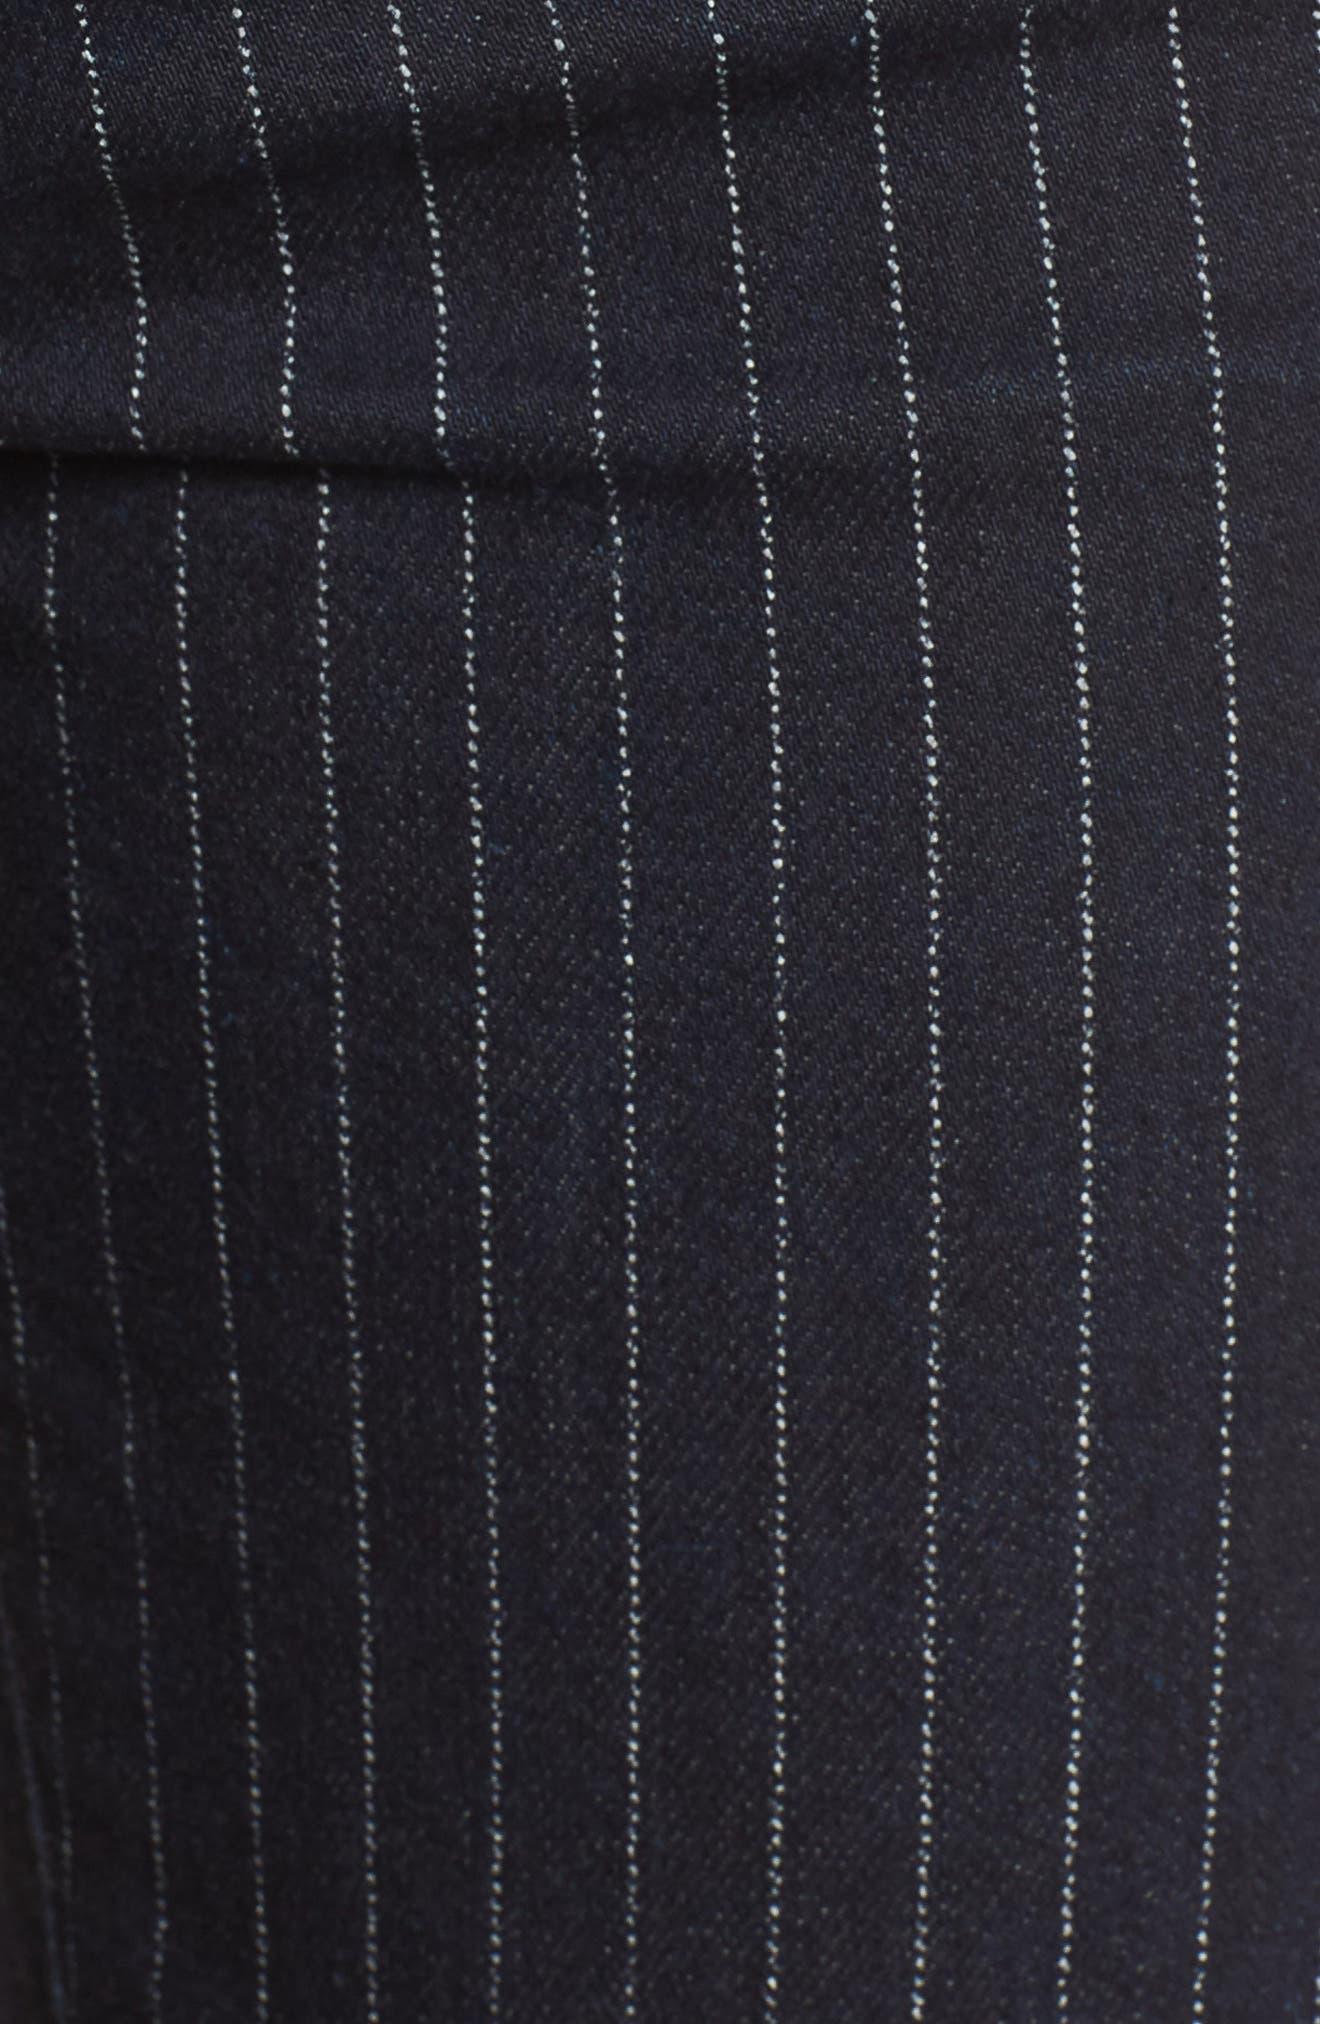 Rocket High Waist Crop Skinny Jeans,                             Alternate thumbnail 6, color,                             Pinstripe